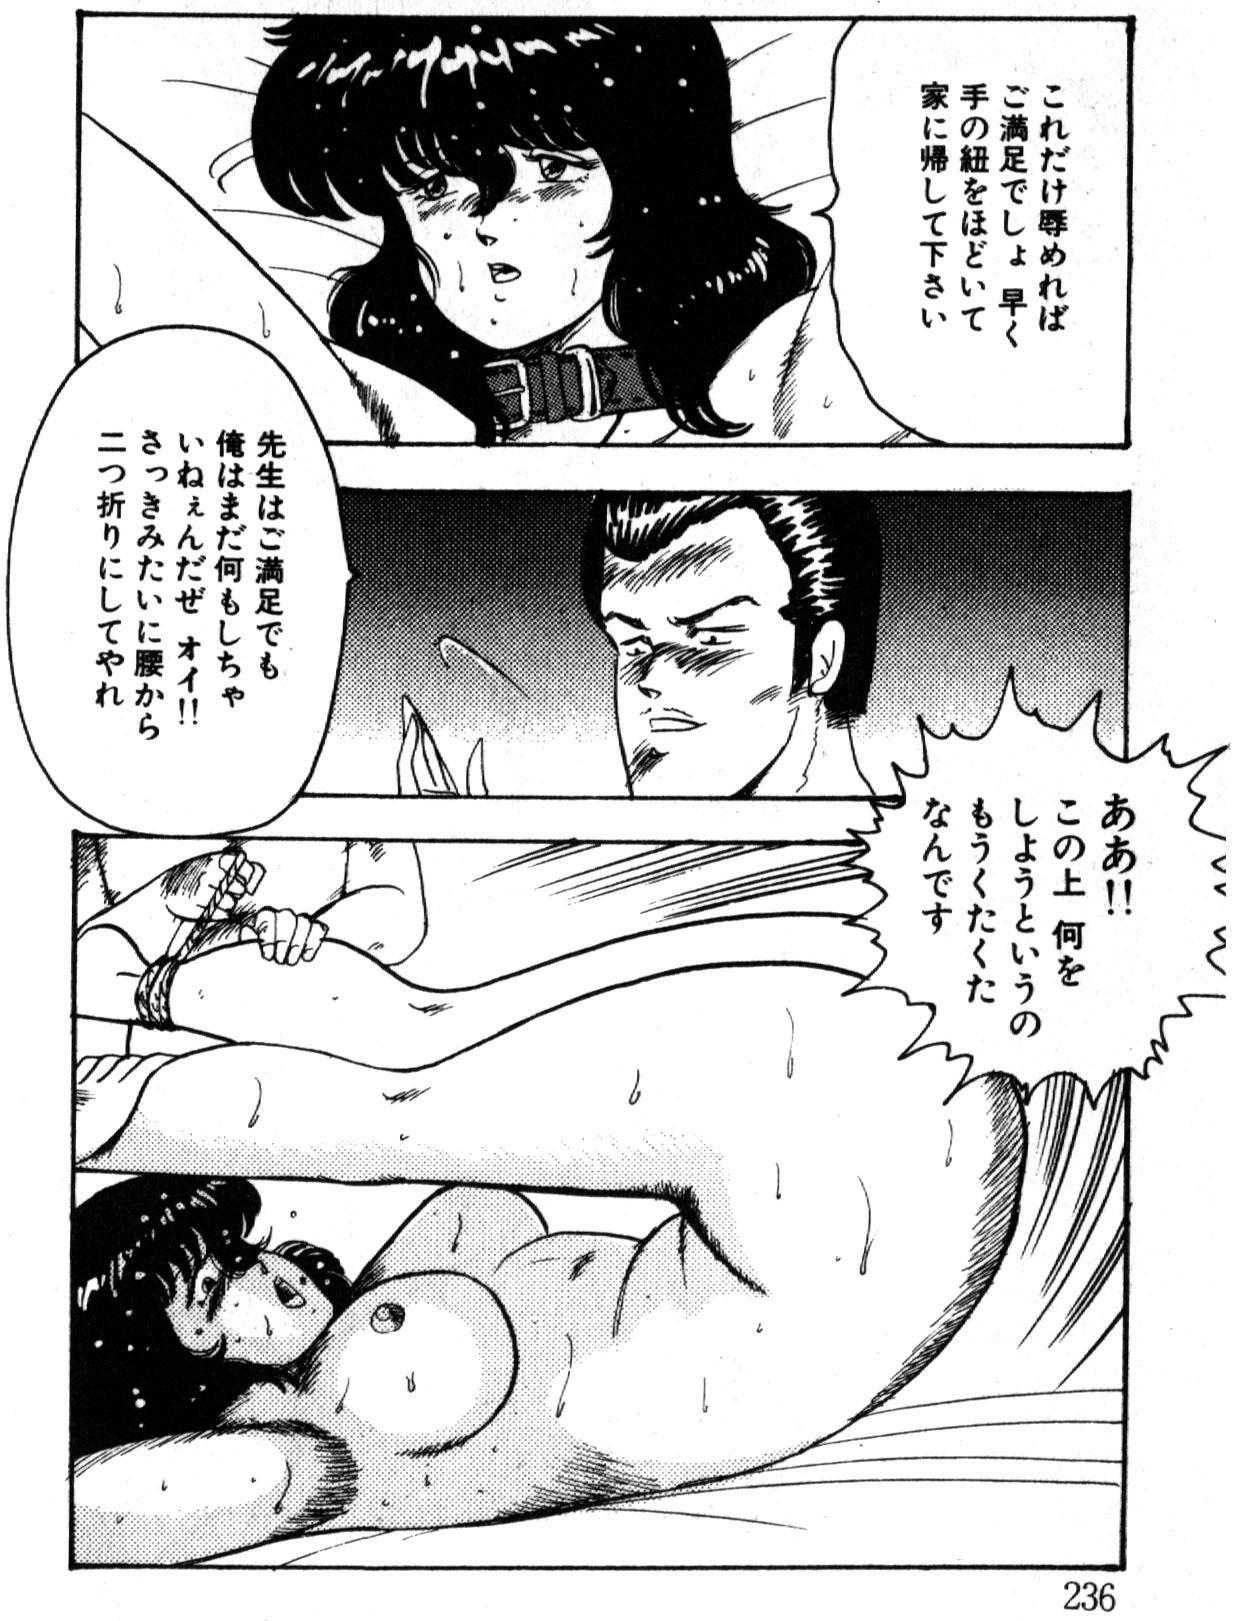 Keiko Sensei no Kagai Jugyou - Keiko Sensei Series 1 235